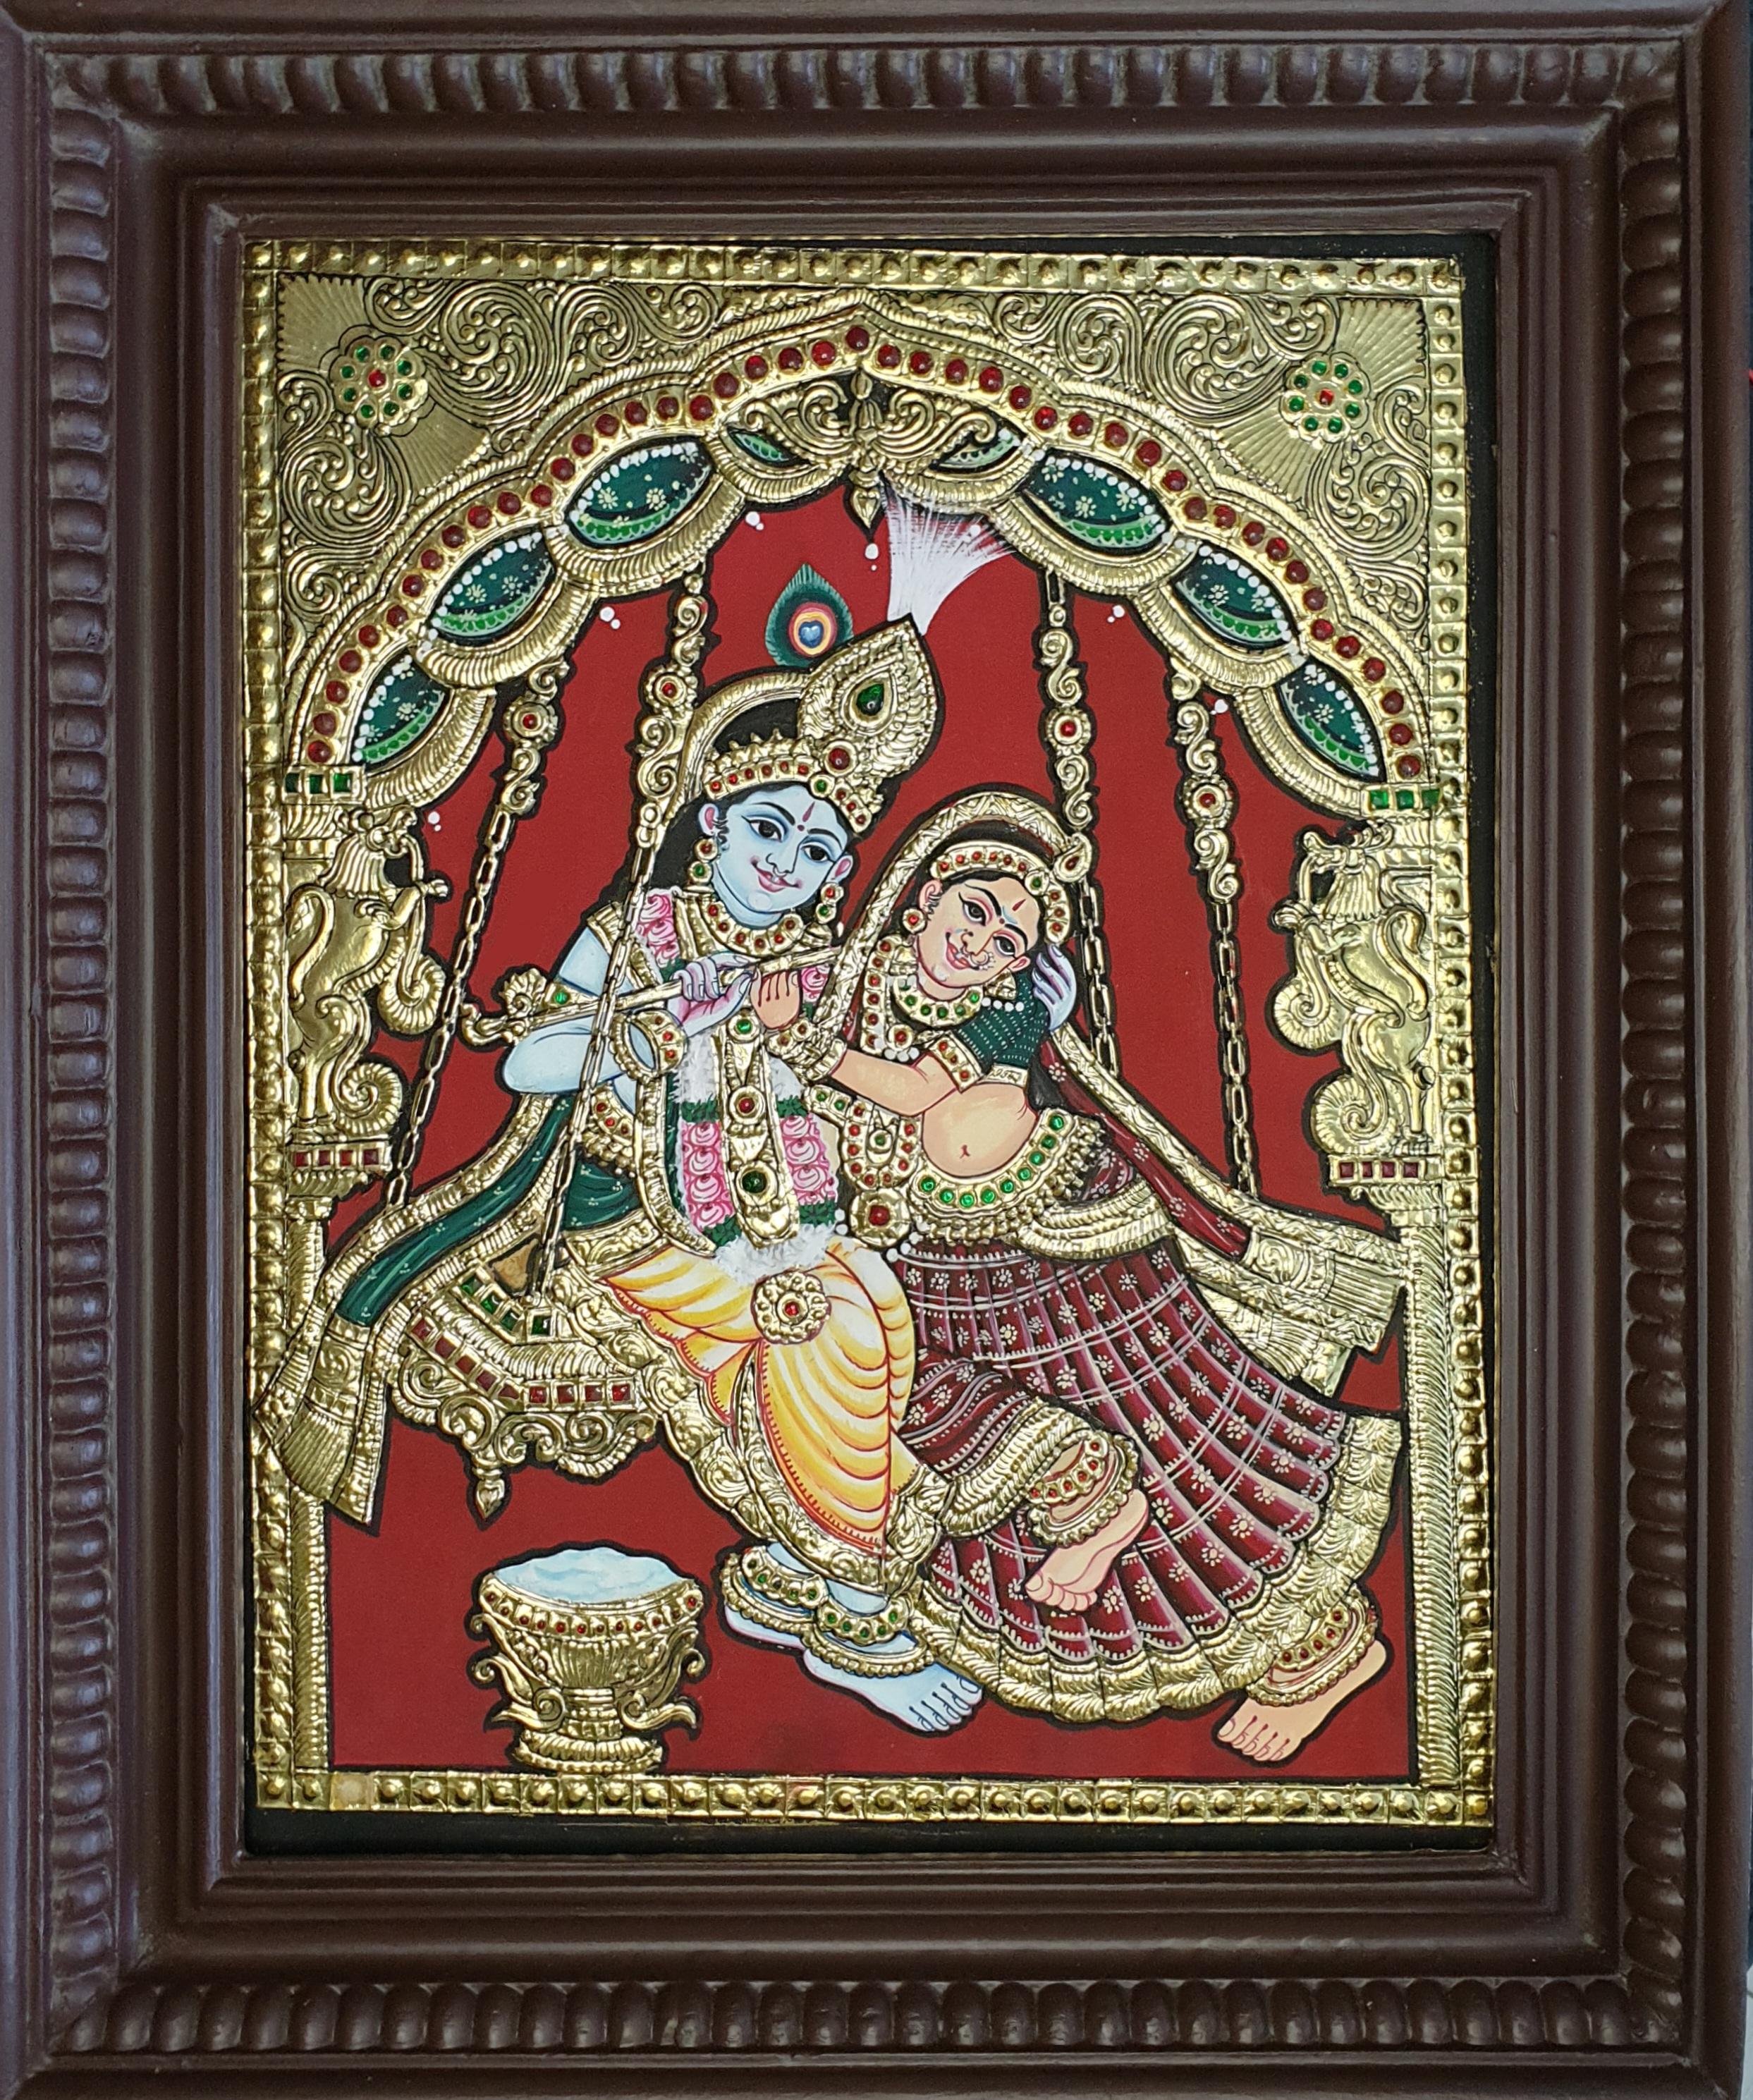 Unjal radhakrishna tanjore painting